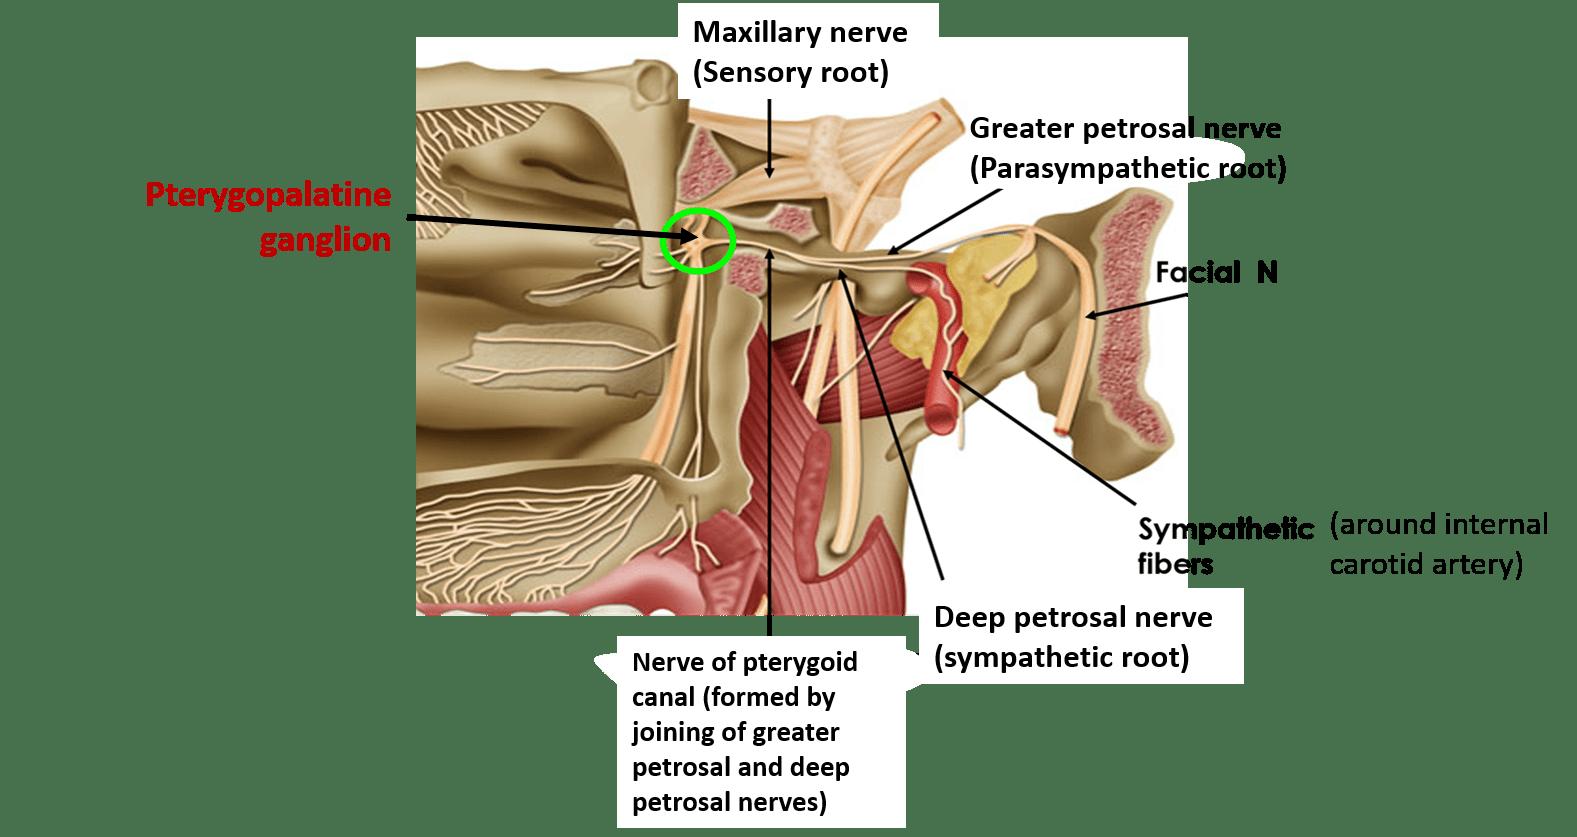 deep petrosal nerve